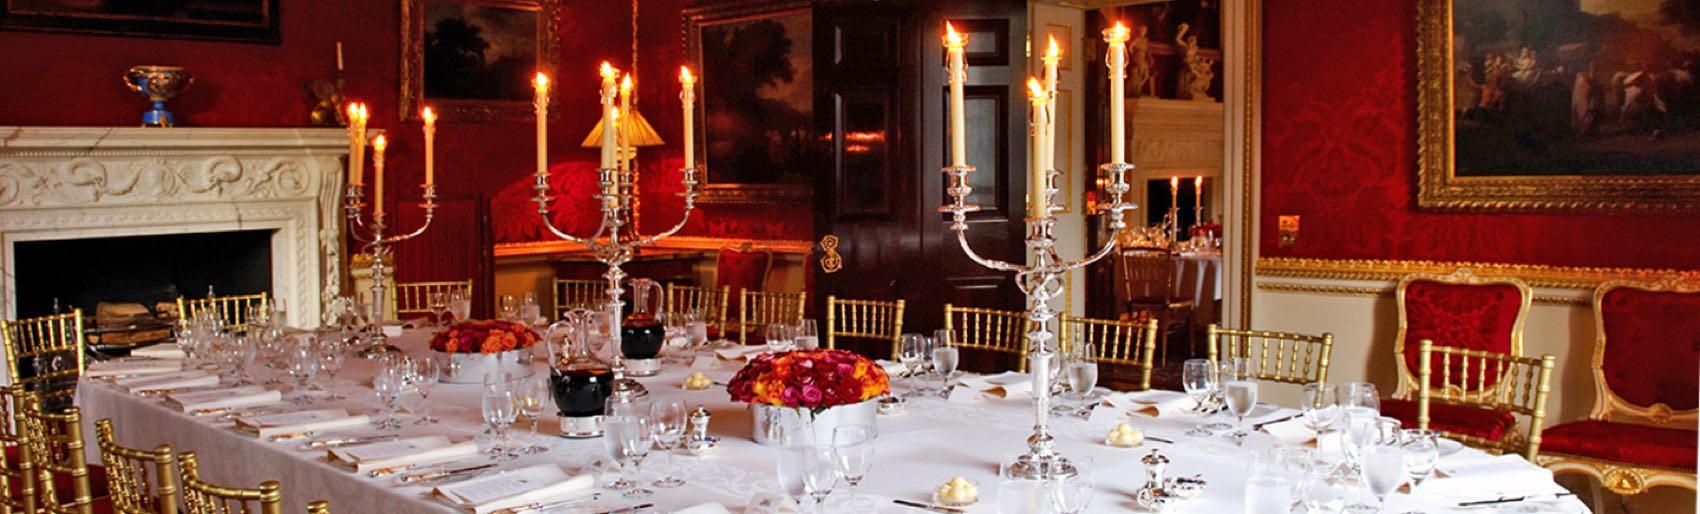 Dinner at Spencer House in Central London